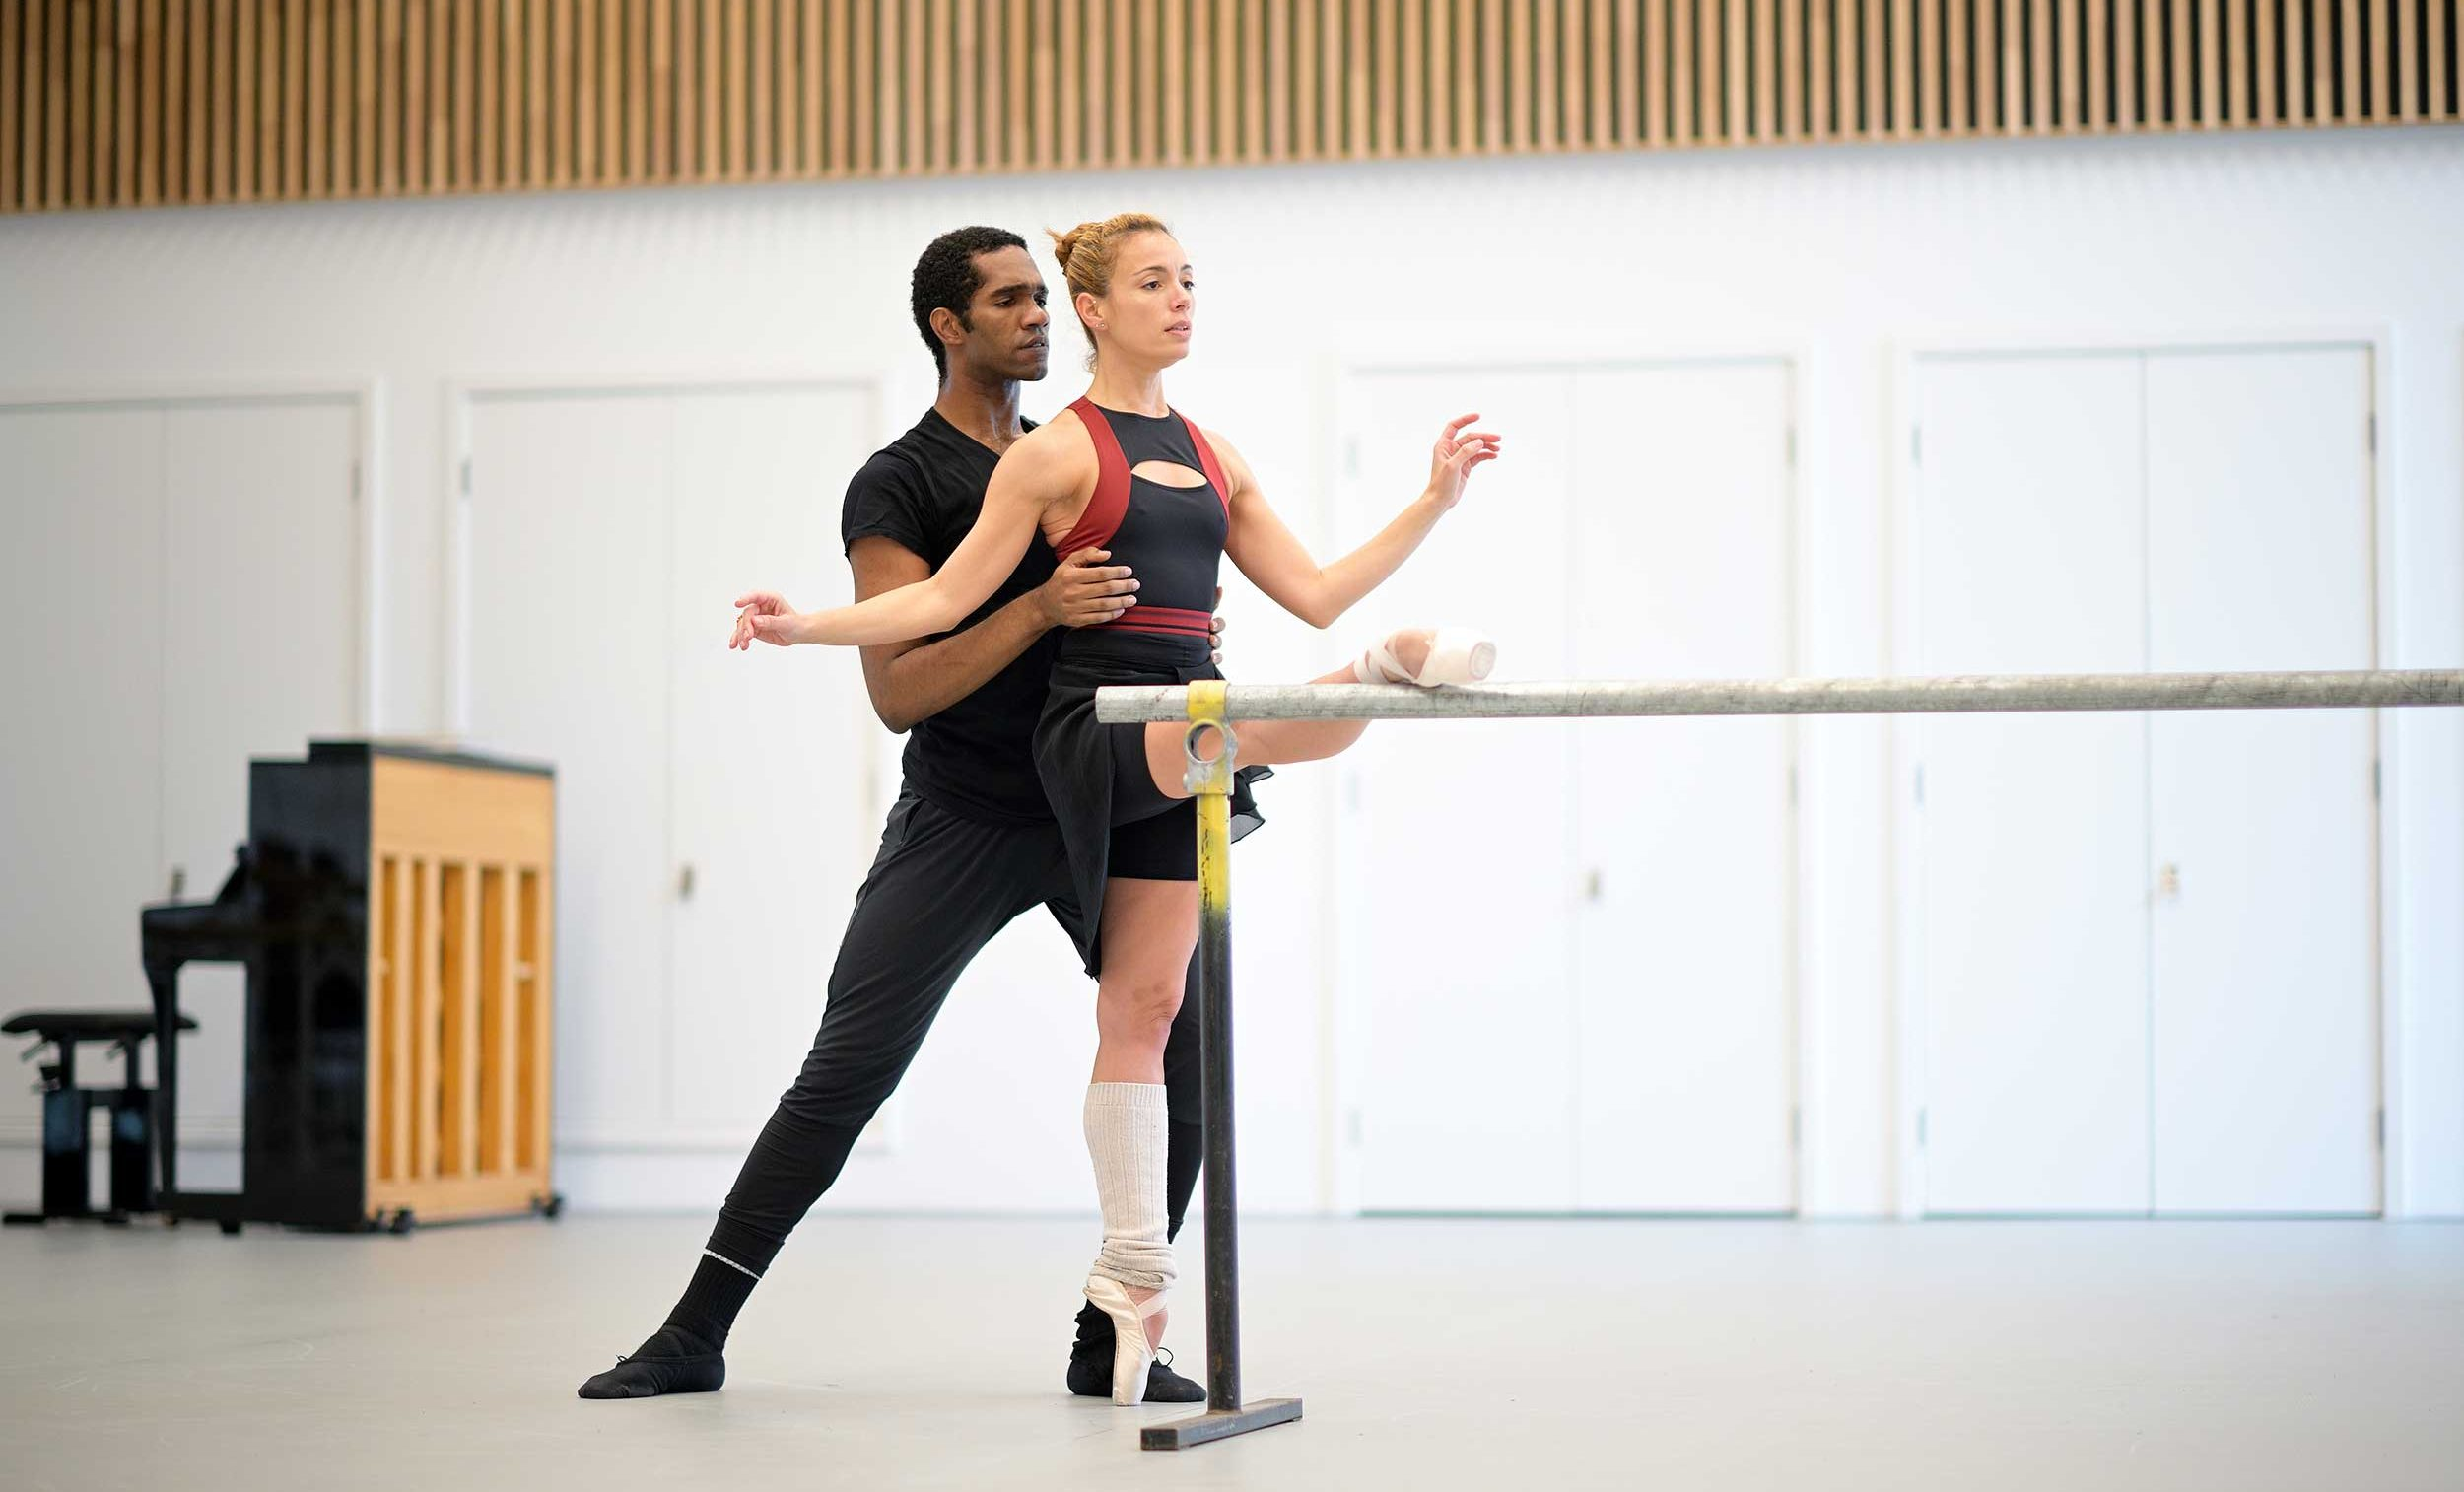 Fernanda-Oliviera-and-Junor-Souza-rehearse-Ben-Stevenson's-Three-Preludes-ahead-of-ENB's-70th-Anniversary-Galas-(C)-Laurent-L-(2)